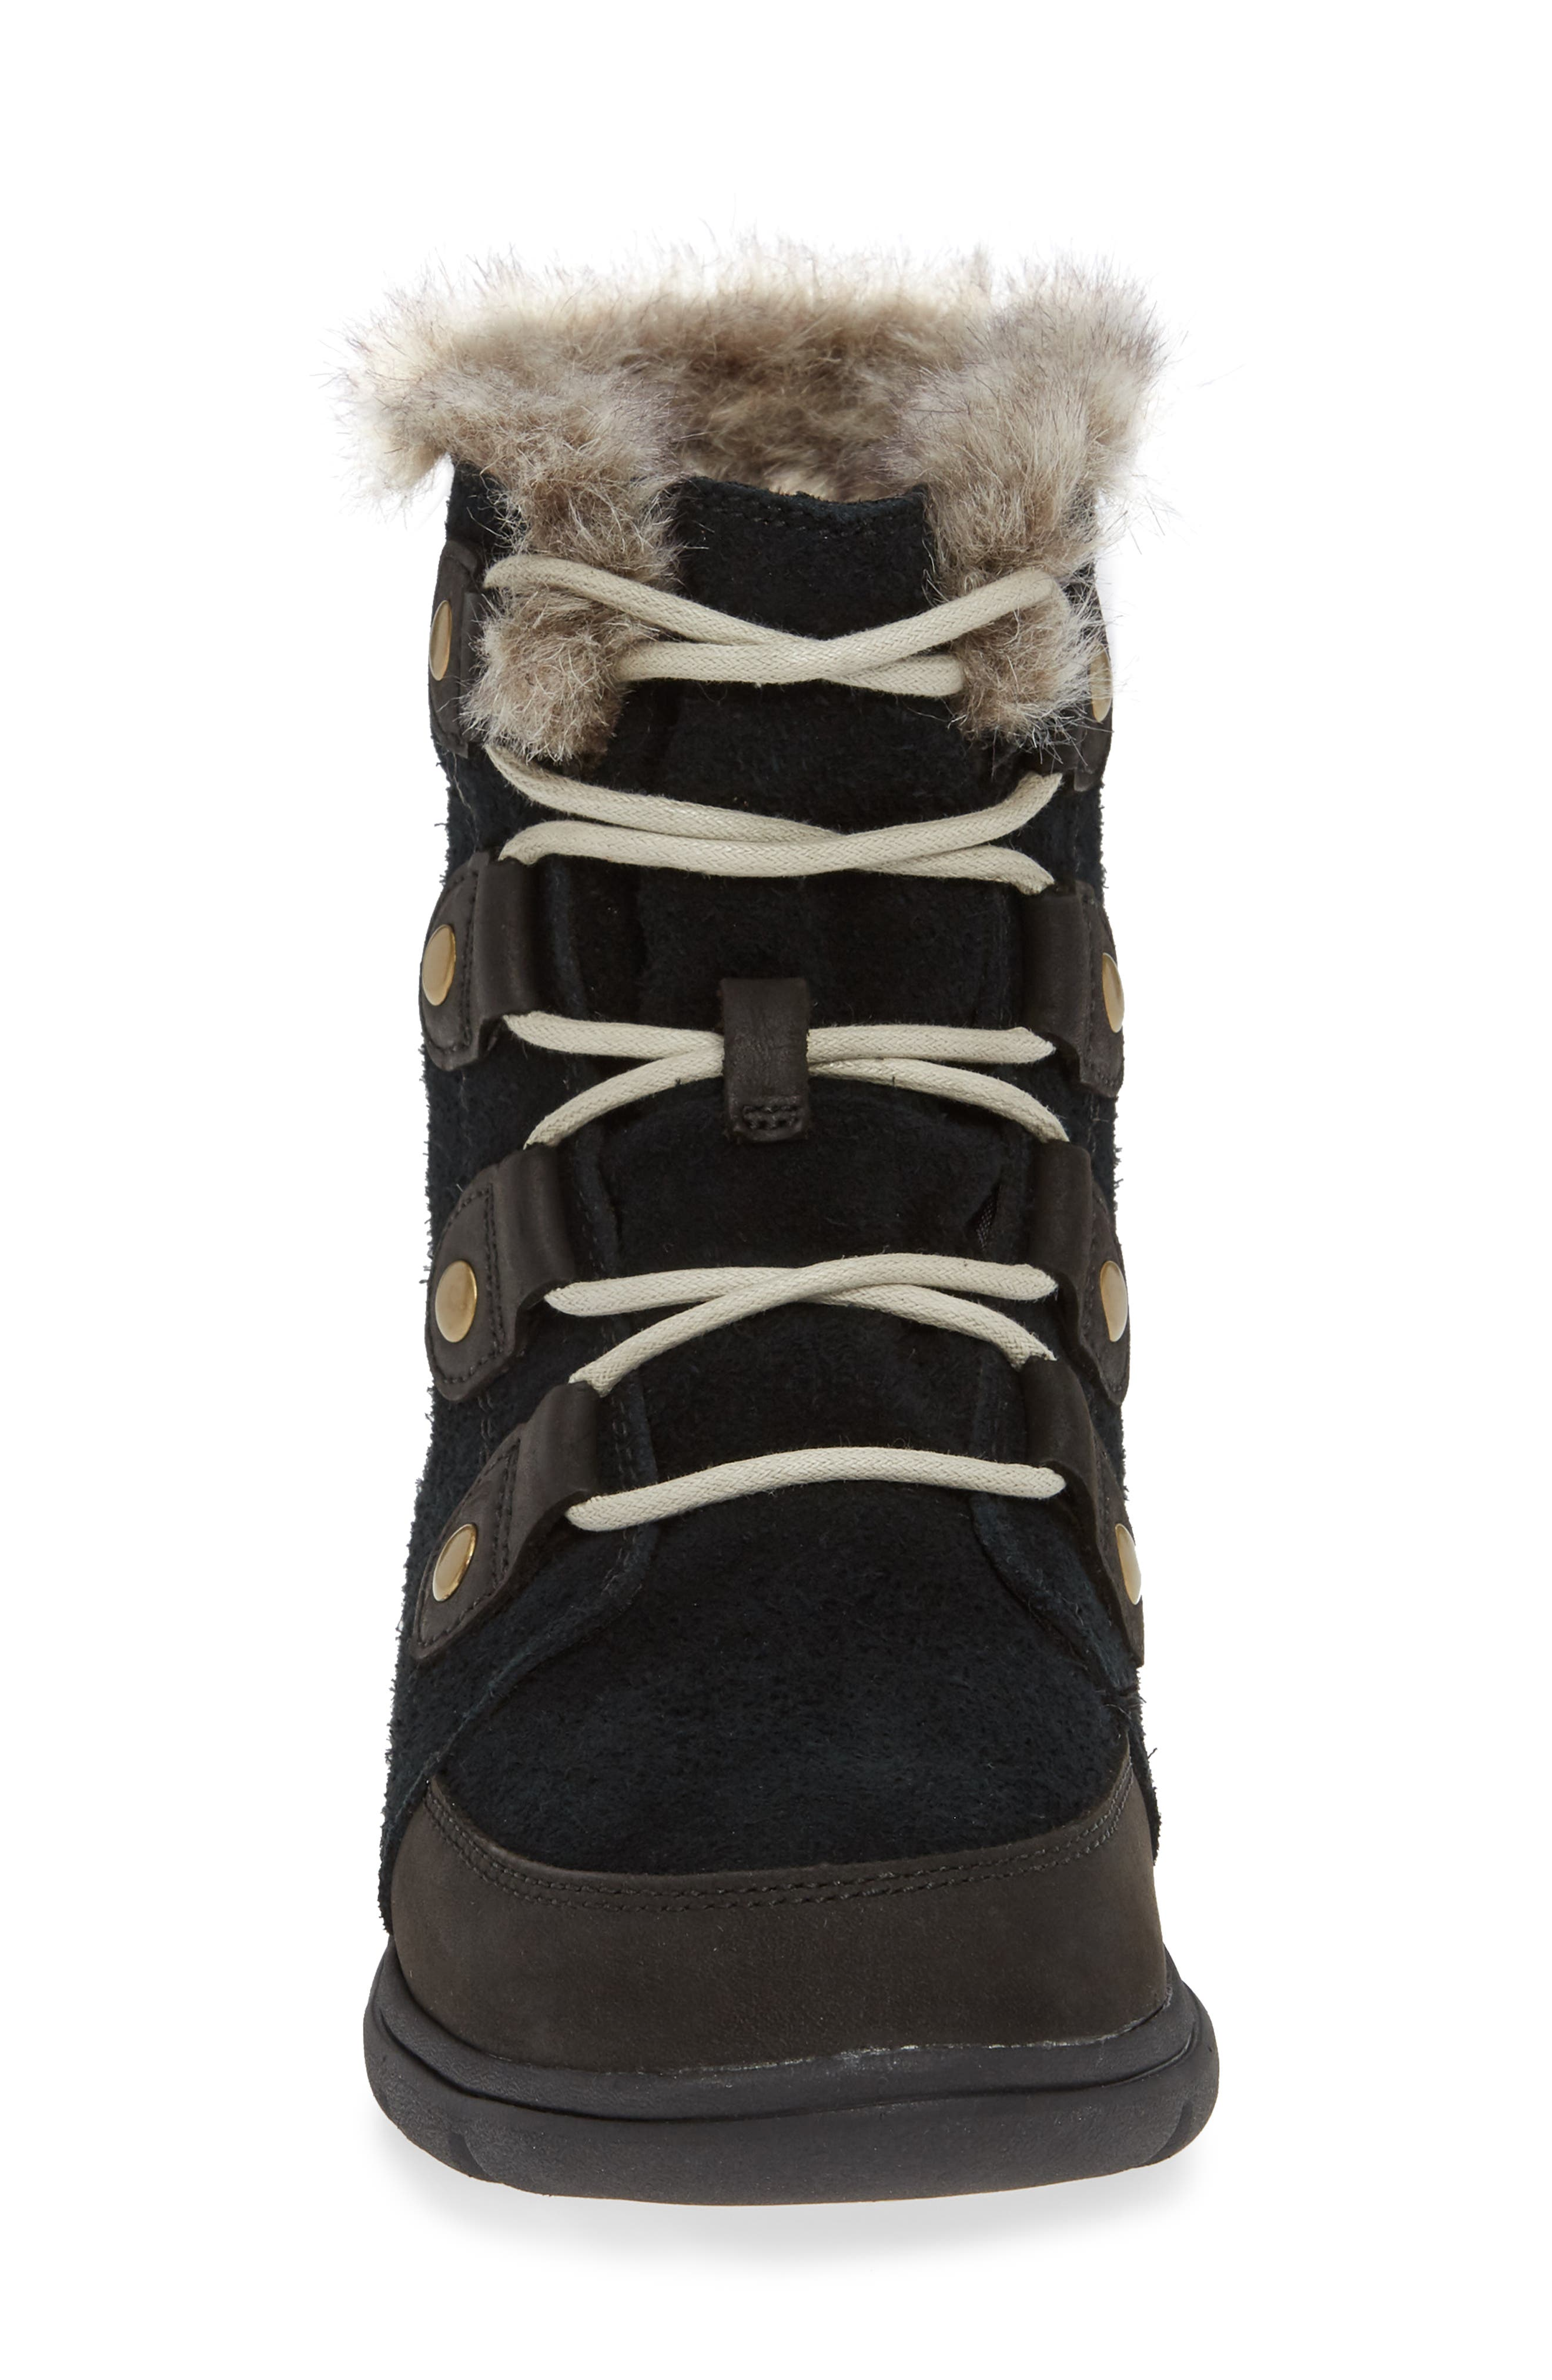 Explorer Joan Waterproof Boot with Faux Fur Collar,                             Alternate thumbnail 4, color,                             BLACK/ DARK STONE